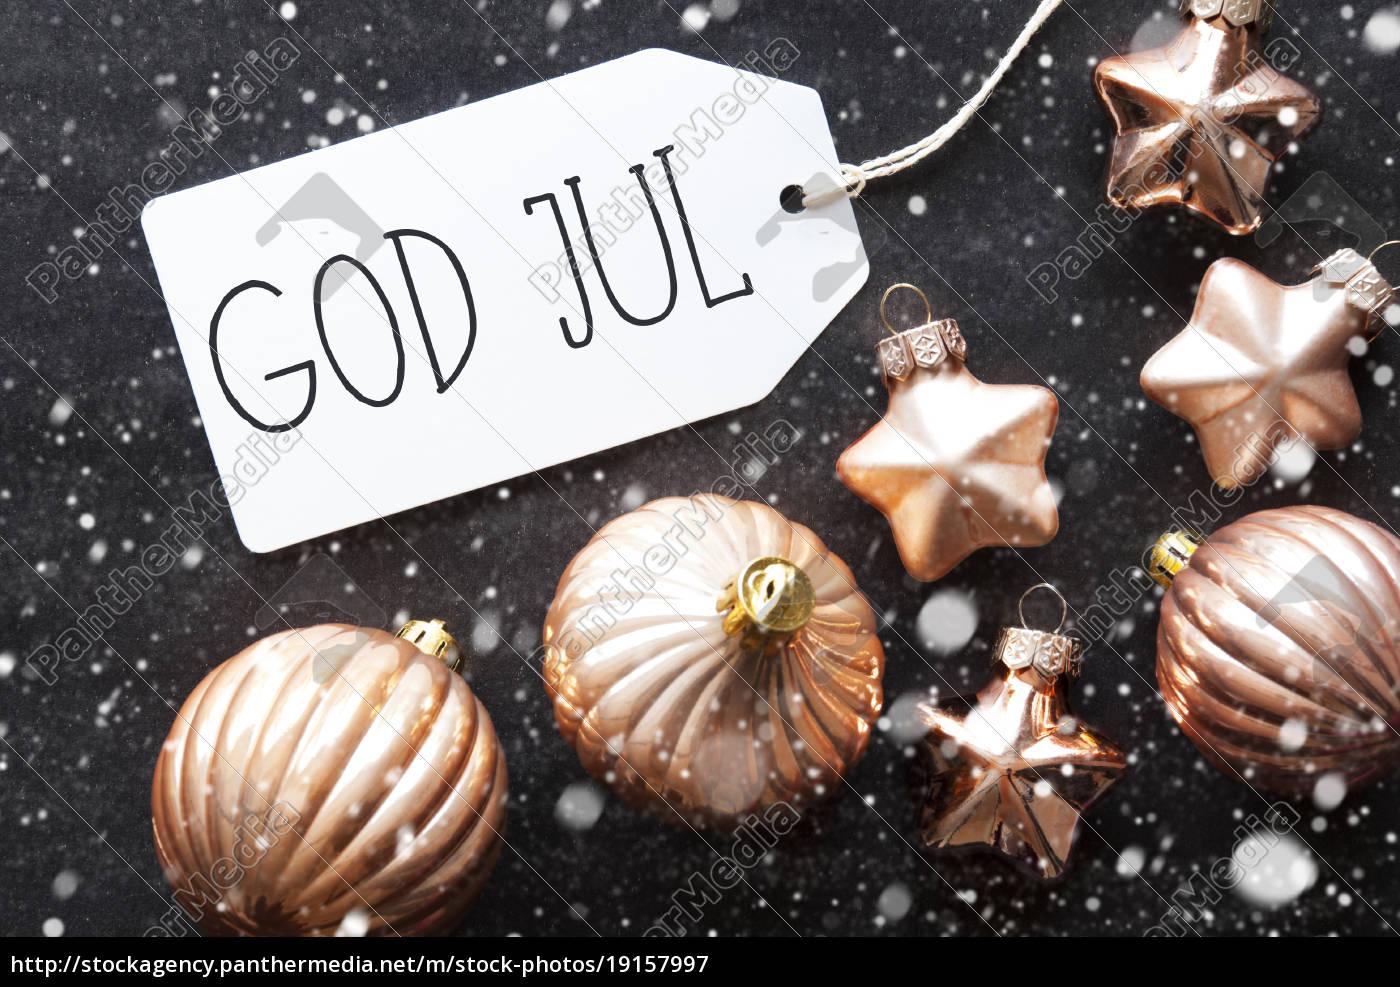 bronze, balls, , snowflakes, , god, jul, means - 19157997